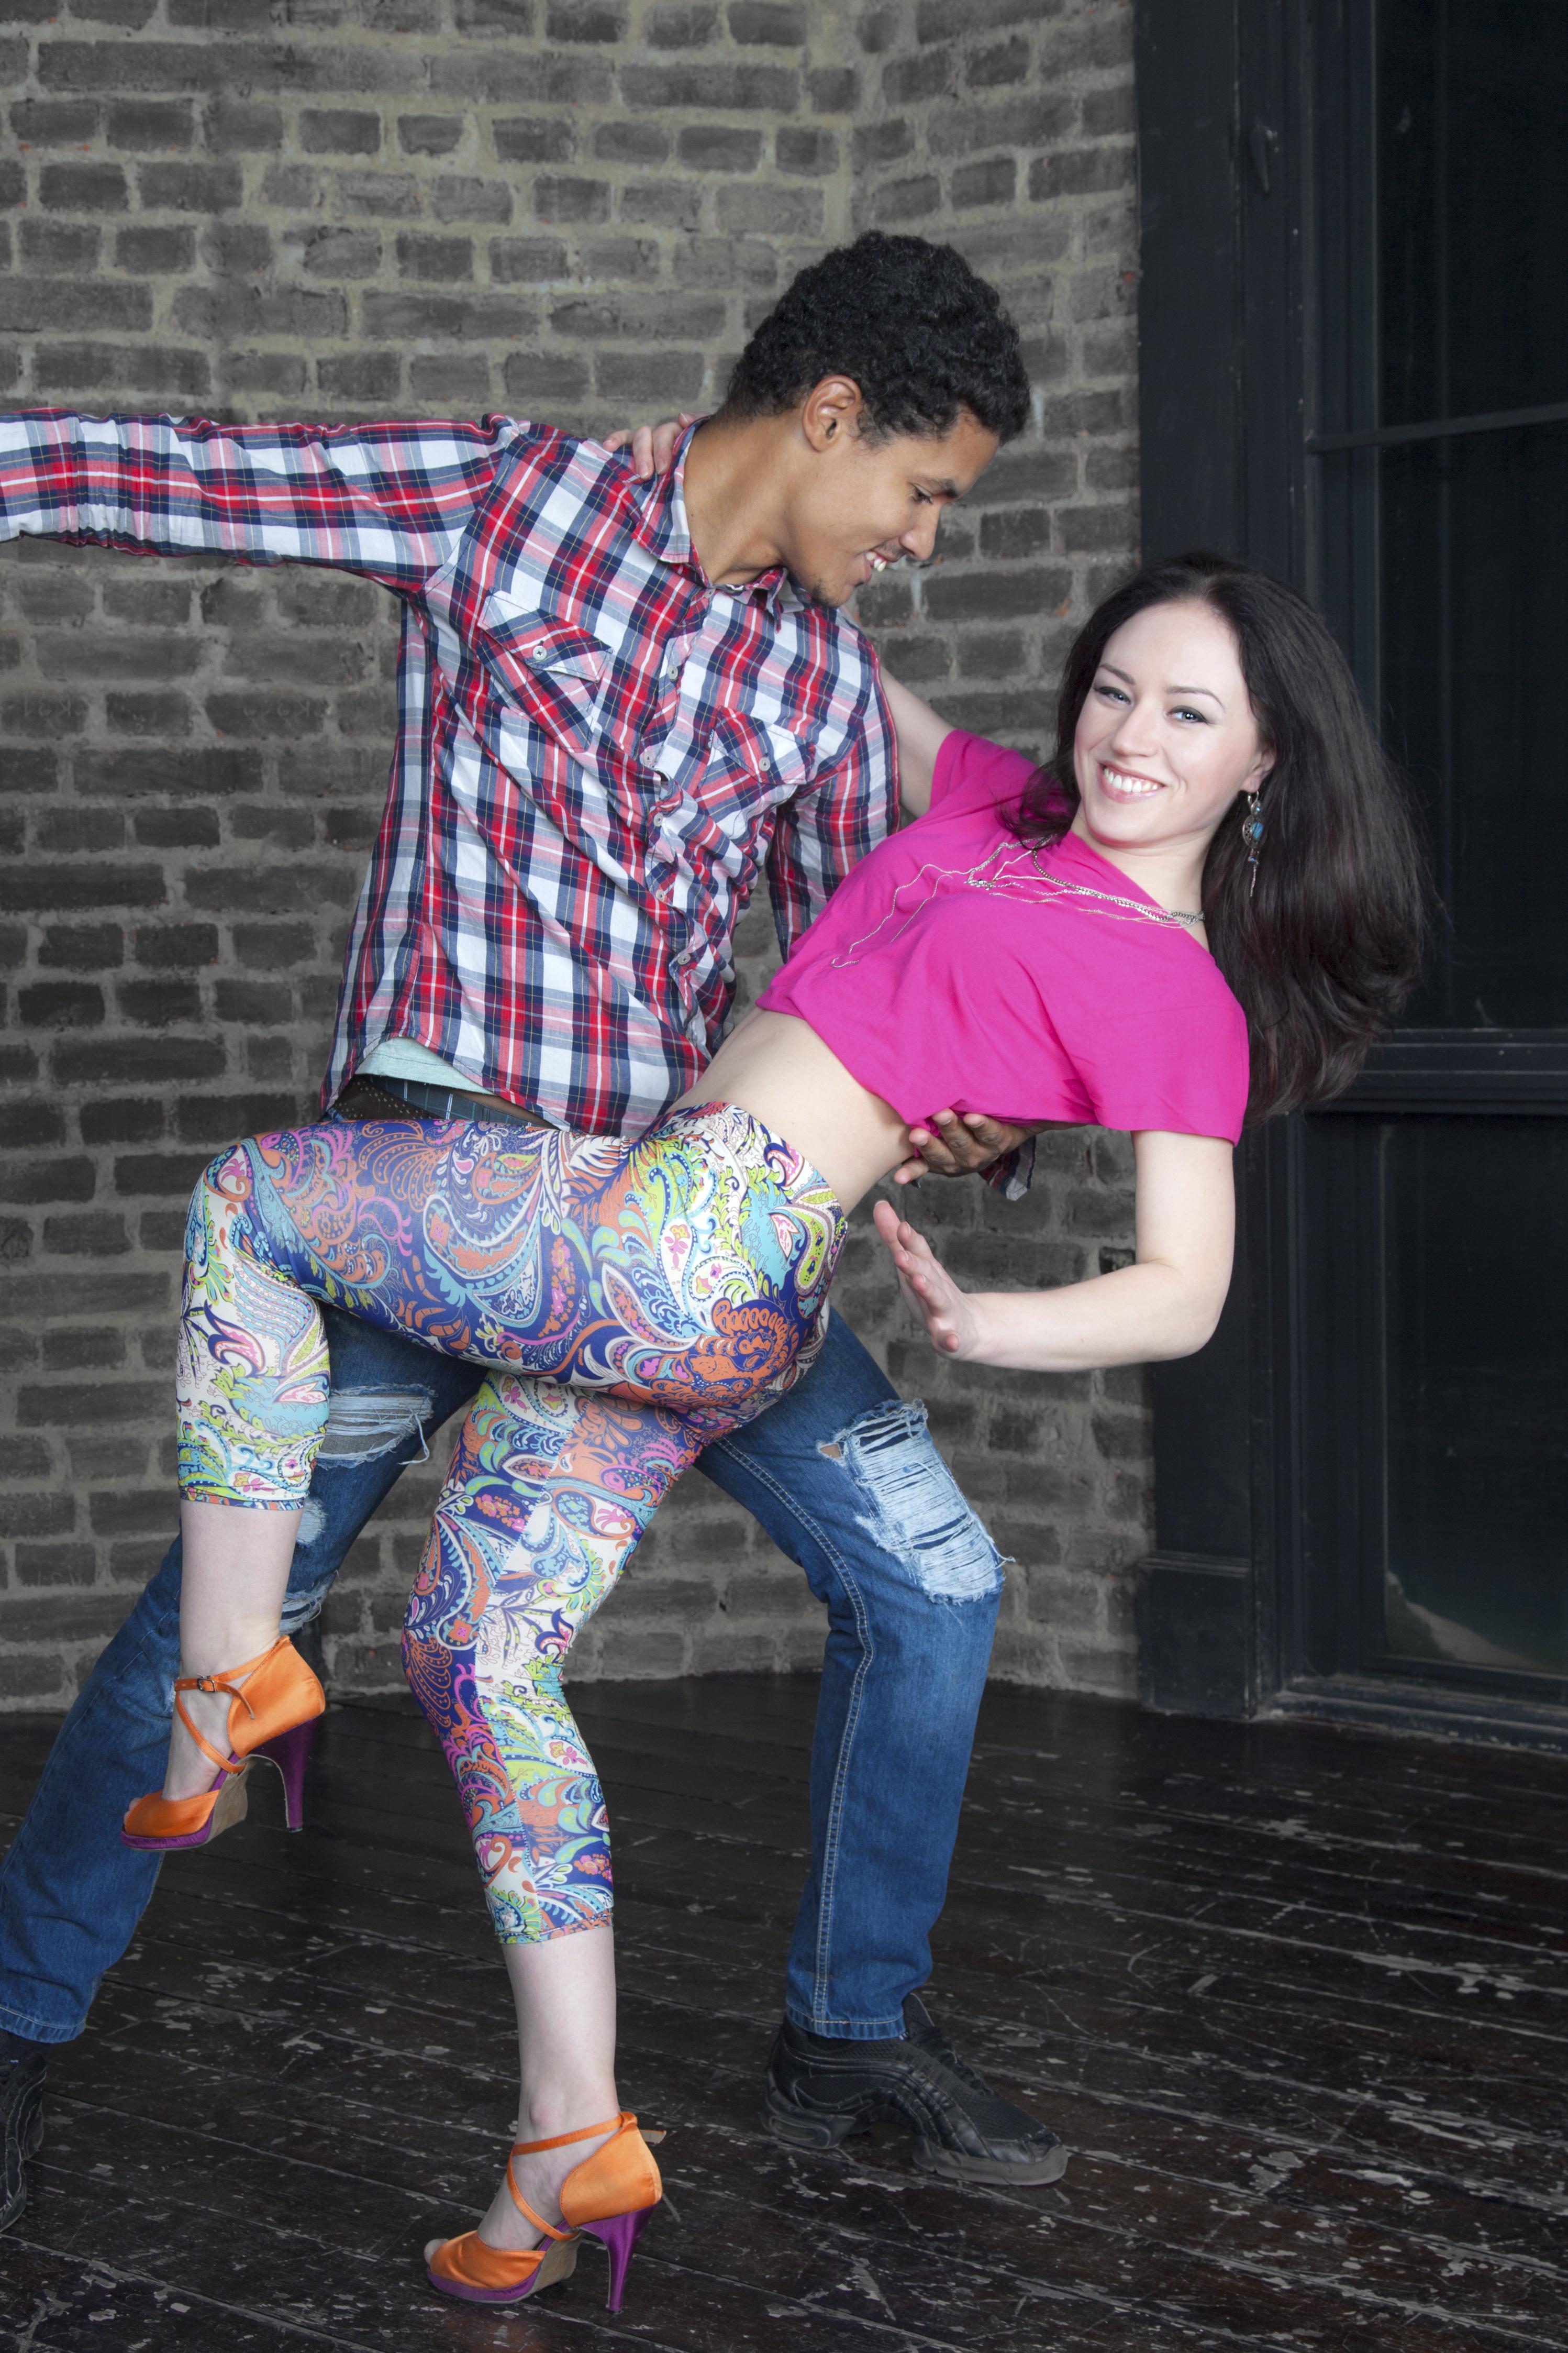 бачата, бачата в москве, бачата танец, танец ,парные танцы, школа танцев, bachata, bachata dance